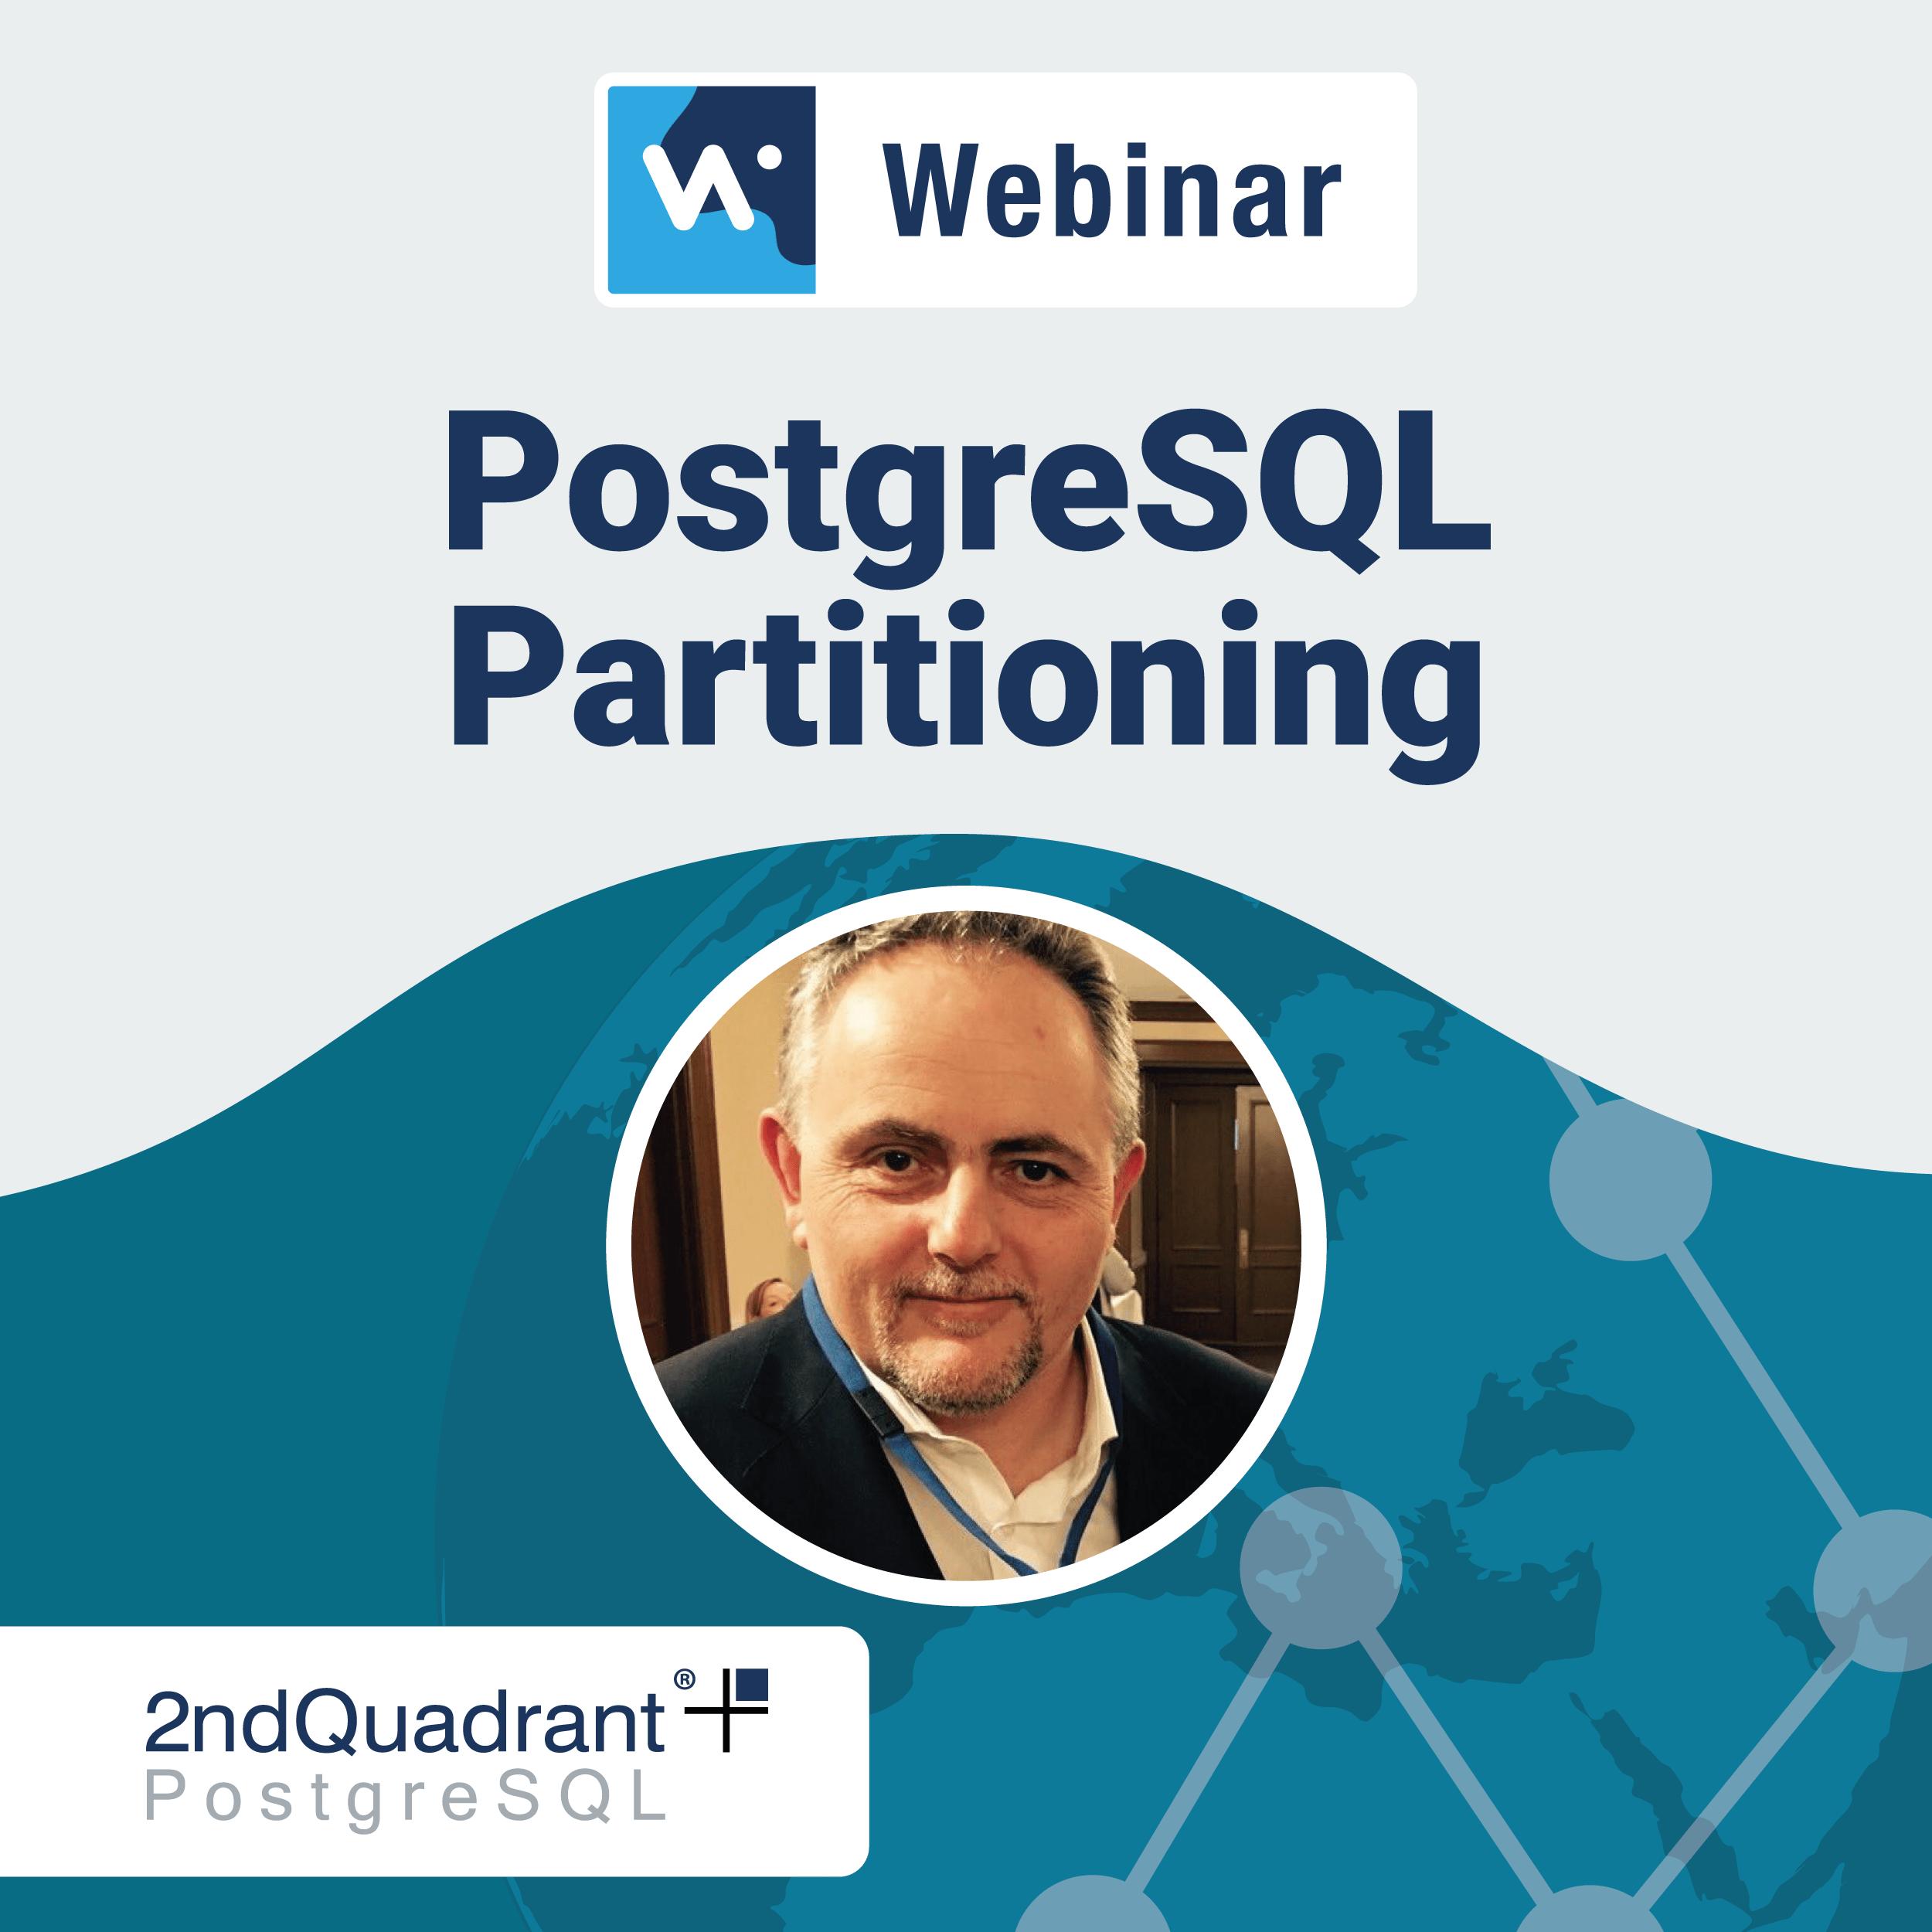 PostgreSQL Partitioning Webinar with Simon Riggs